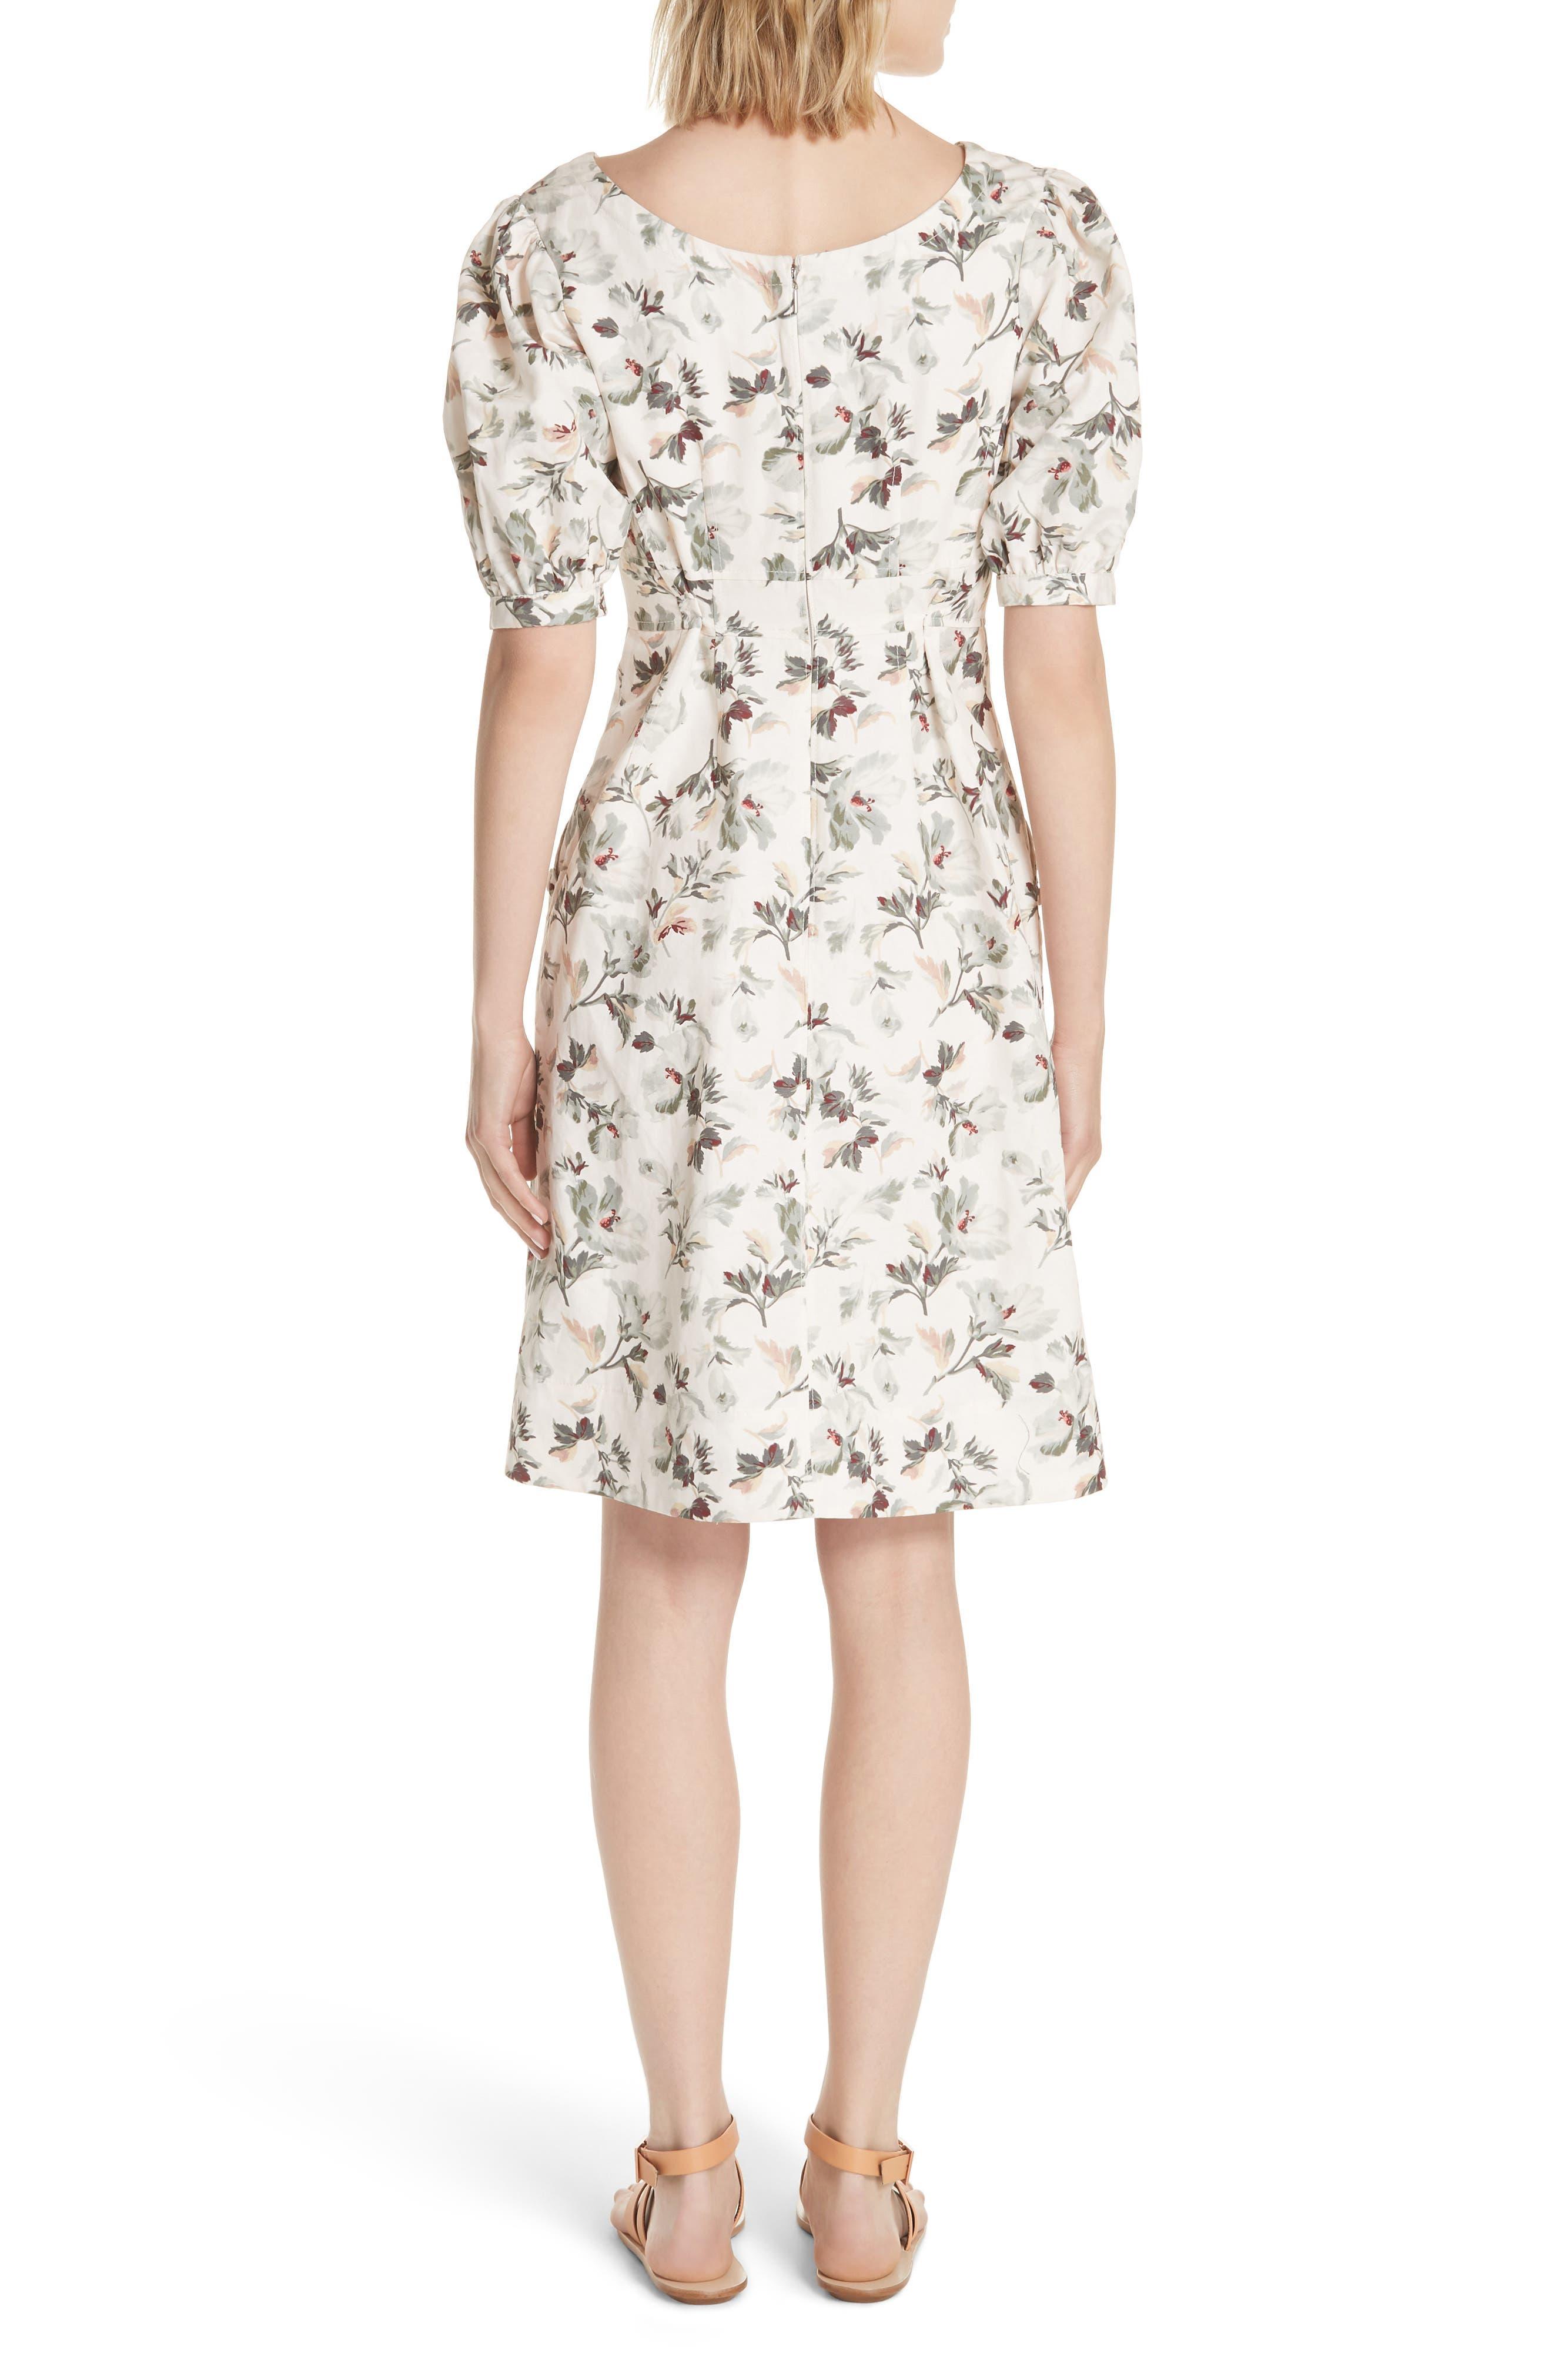 Puff Sleeve Floral Cotton Linen Dress,                             Alternate thumbnail 2, color,                             905